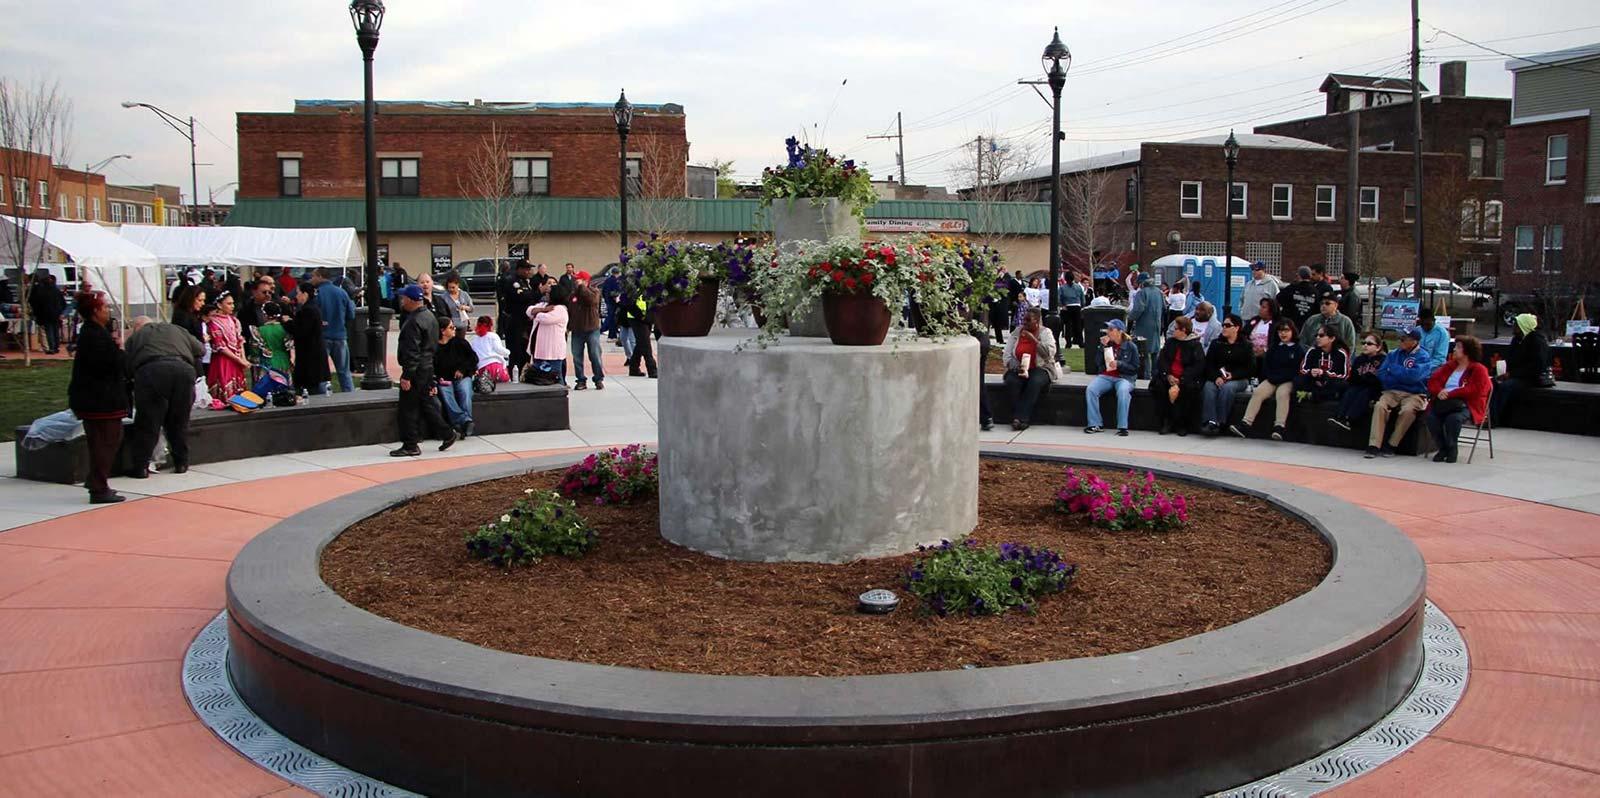 Unity-Plaza-farmers-market-east-chicago.jpg